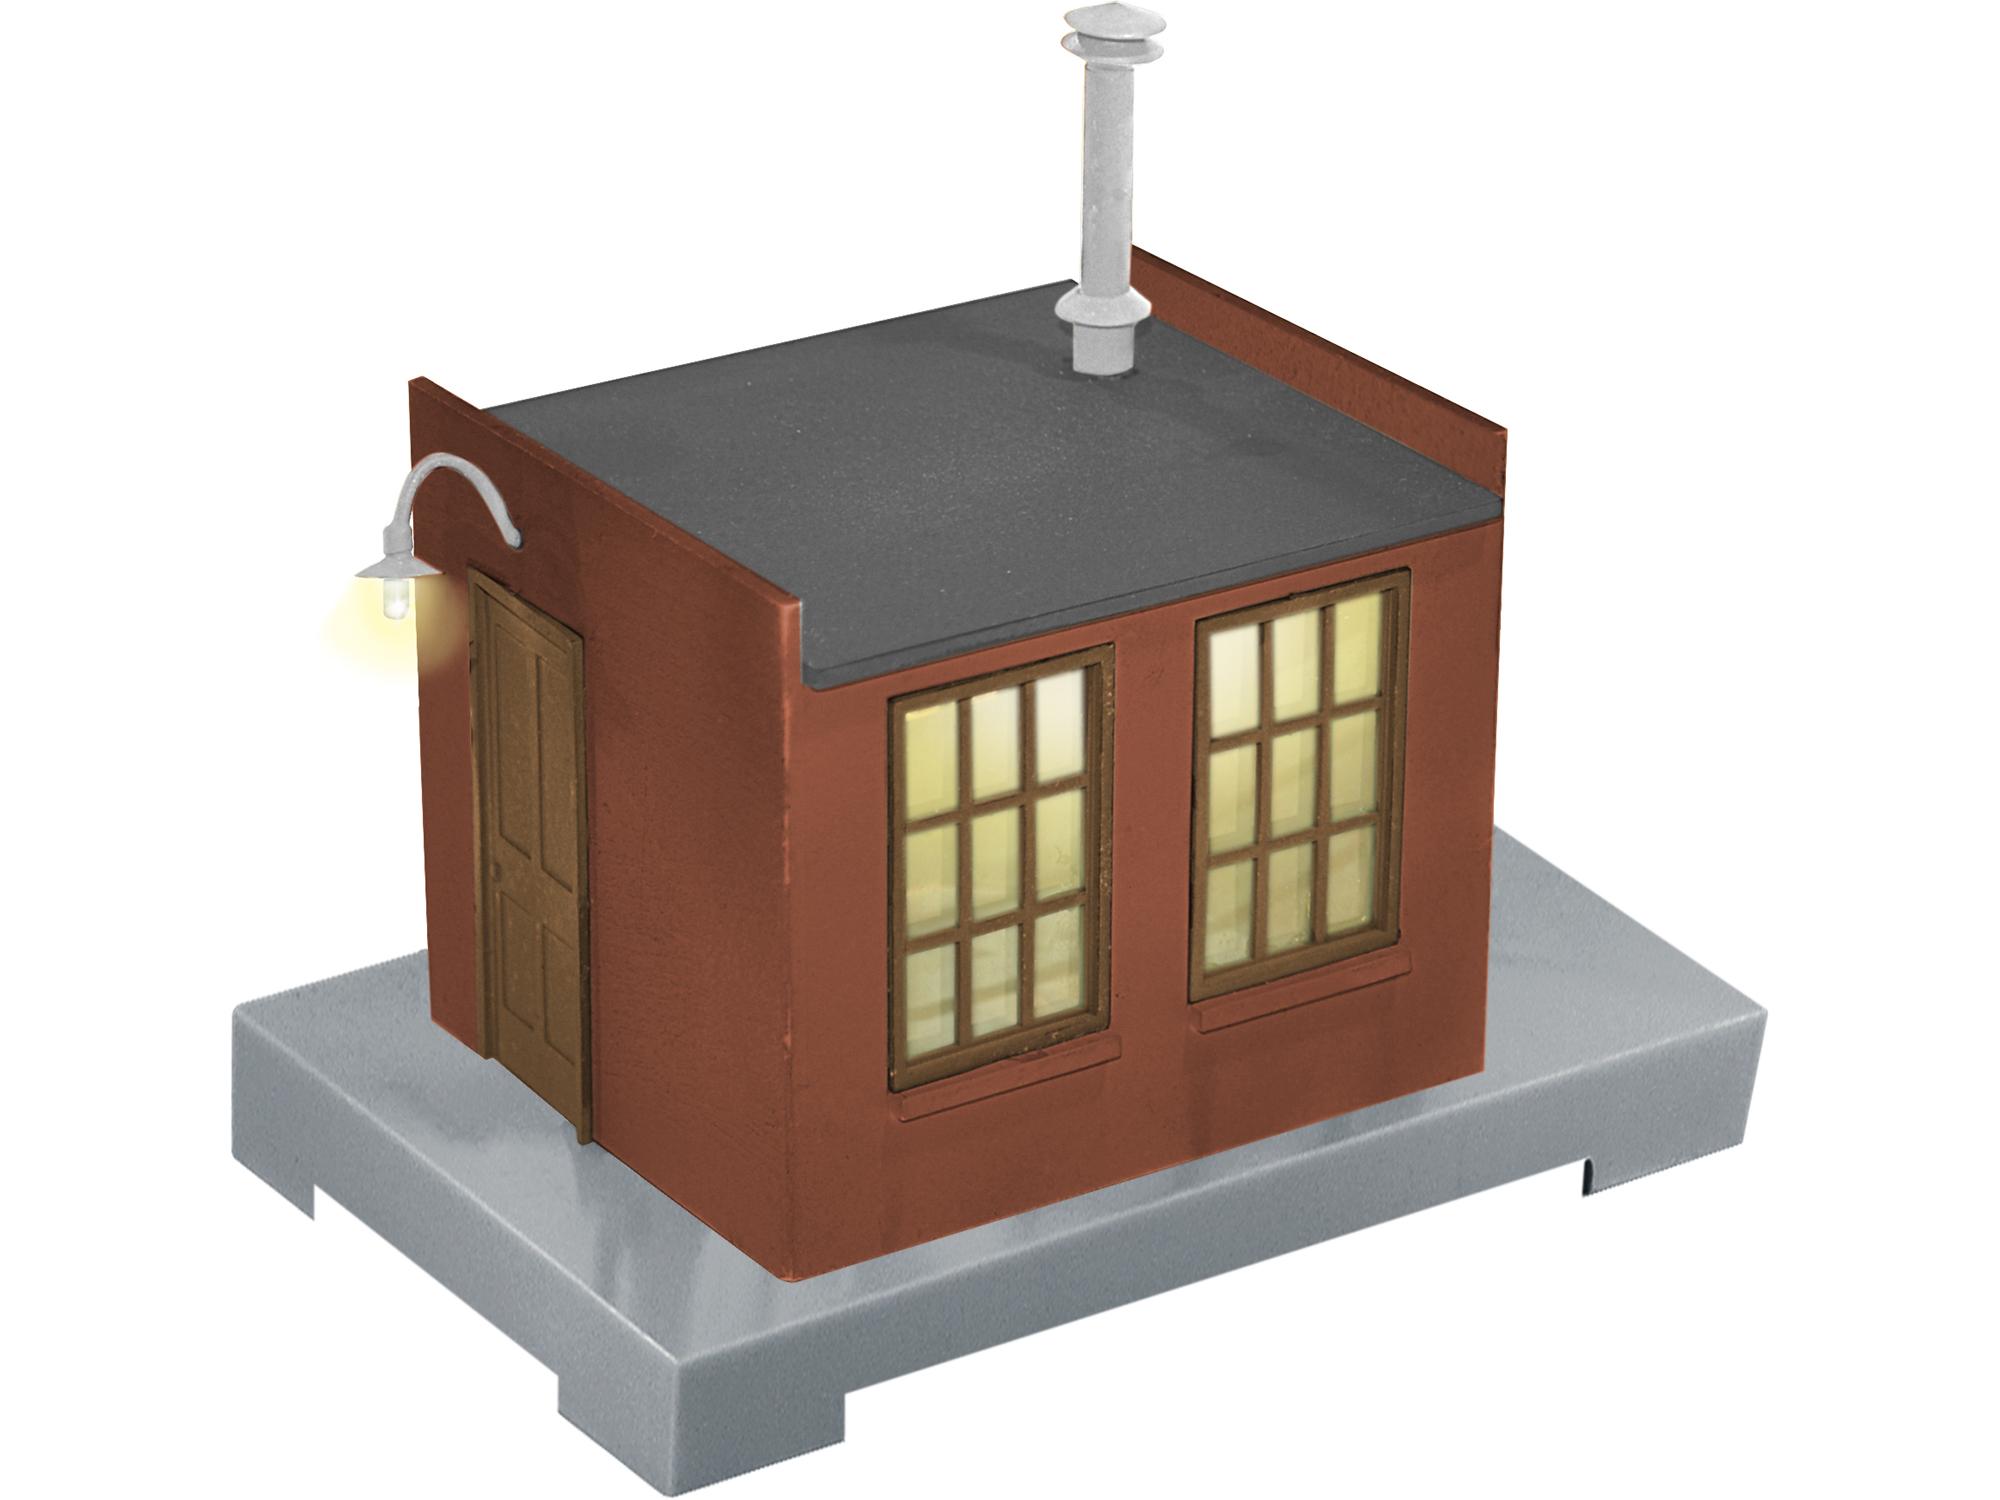 O Early Intermodal Work House w/Sounds